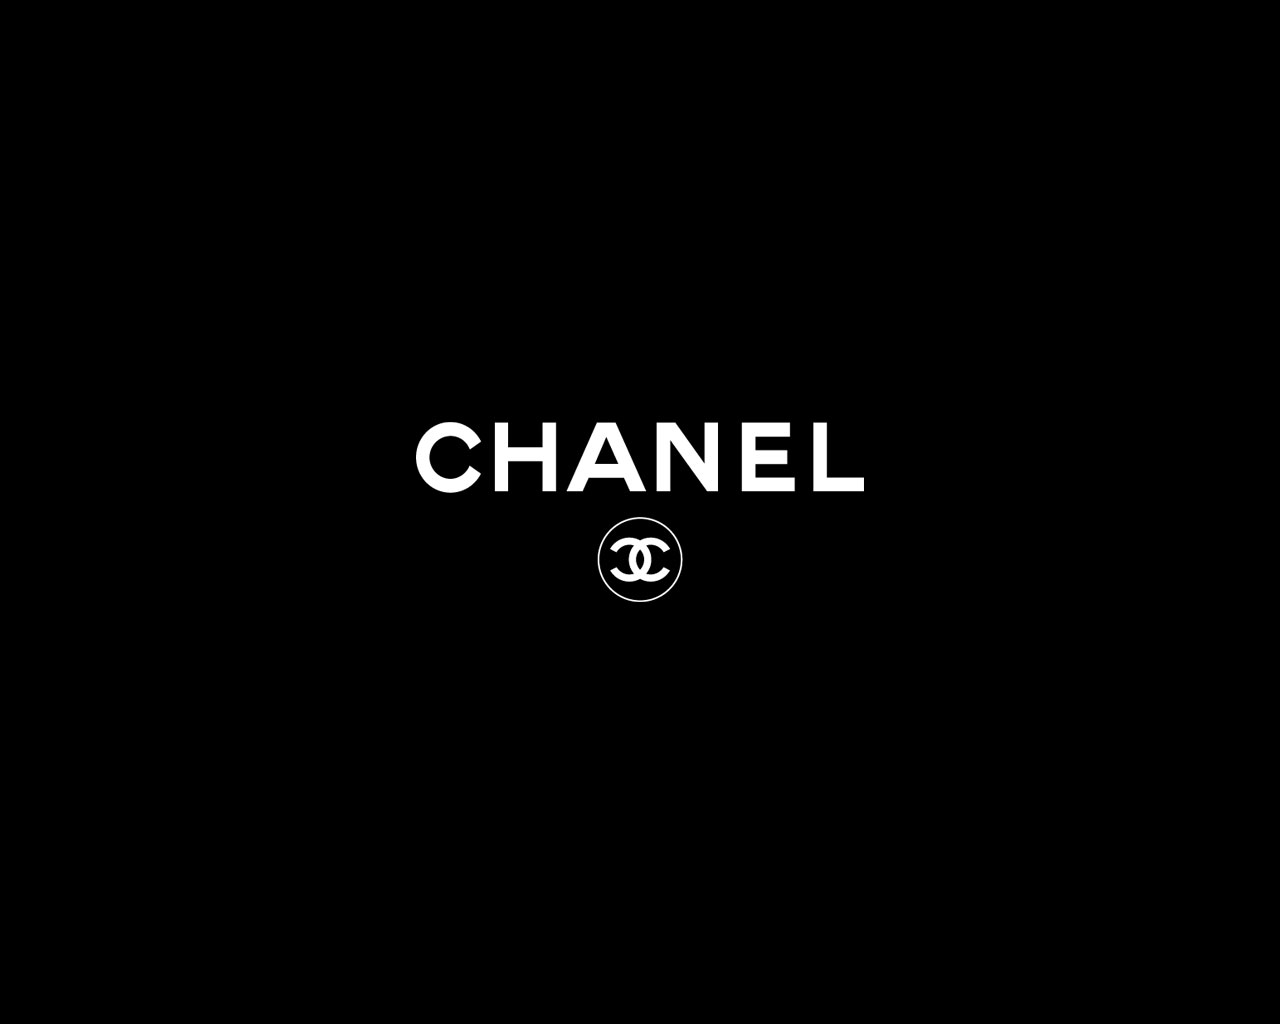 coco chanel logo wallpaper wallpapersafari